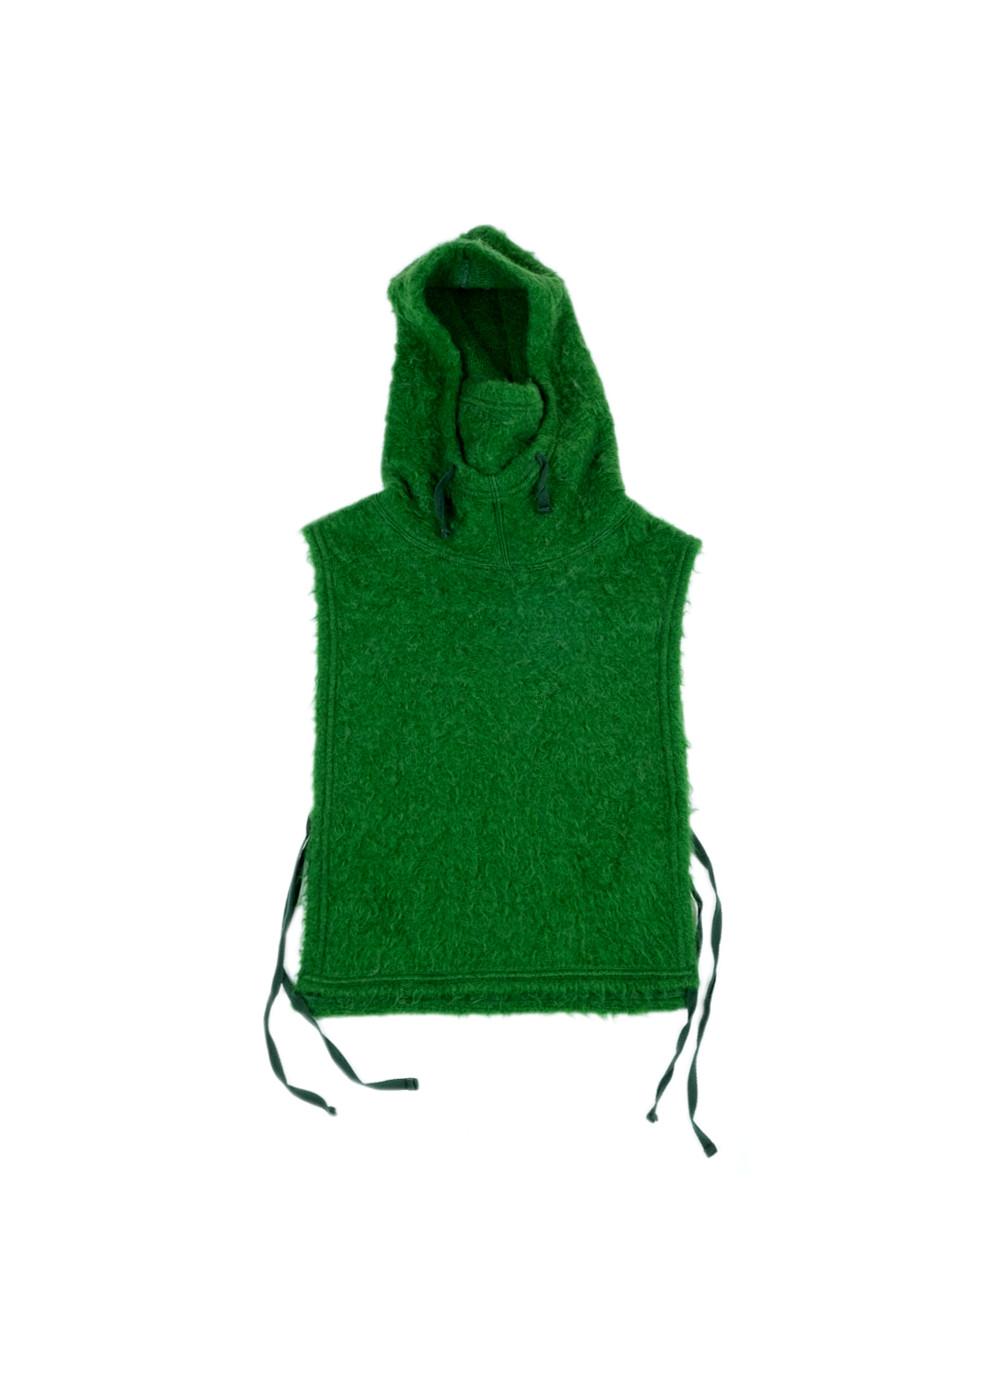 Engineered-Garments-Hooded-Interliner-Kelly-Green-Solid-Mohair-01